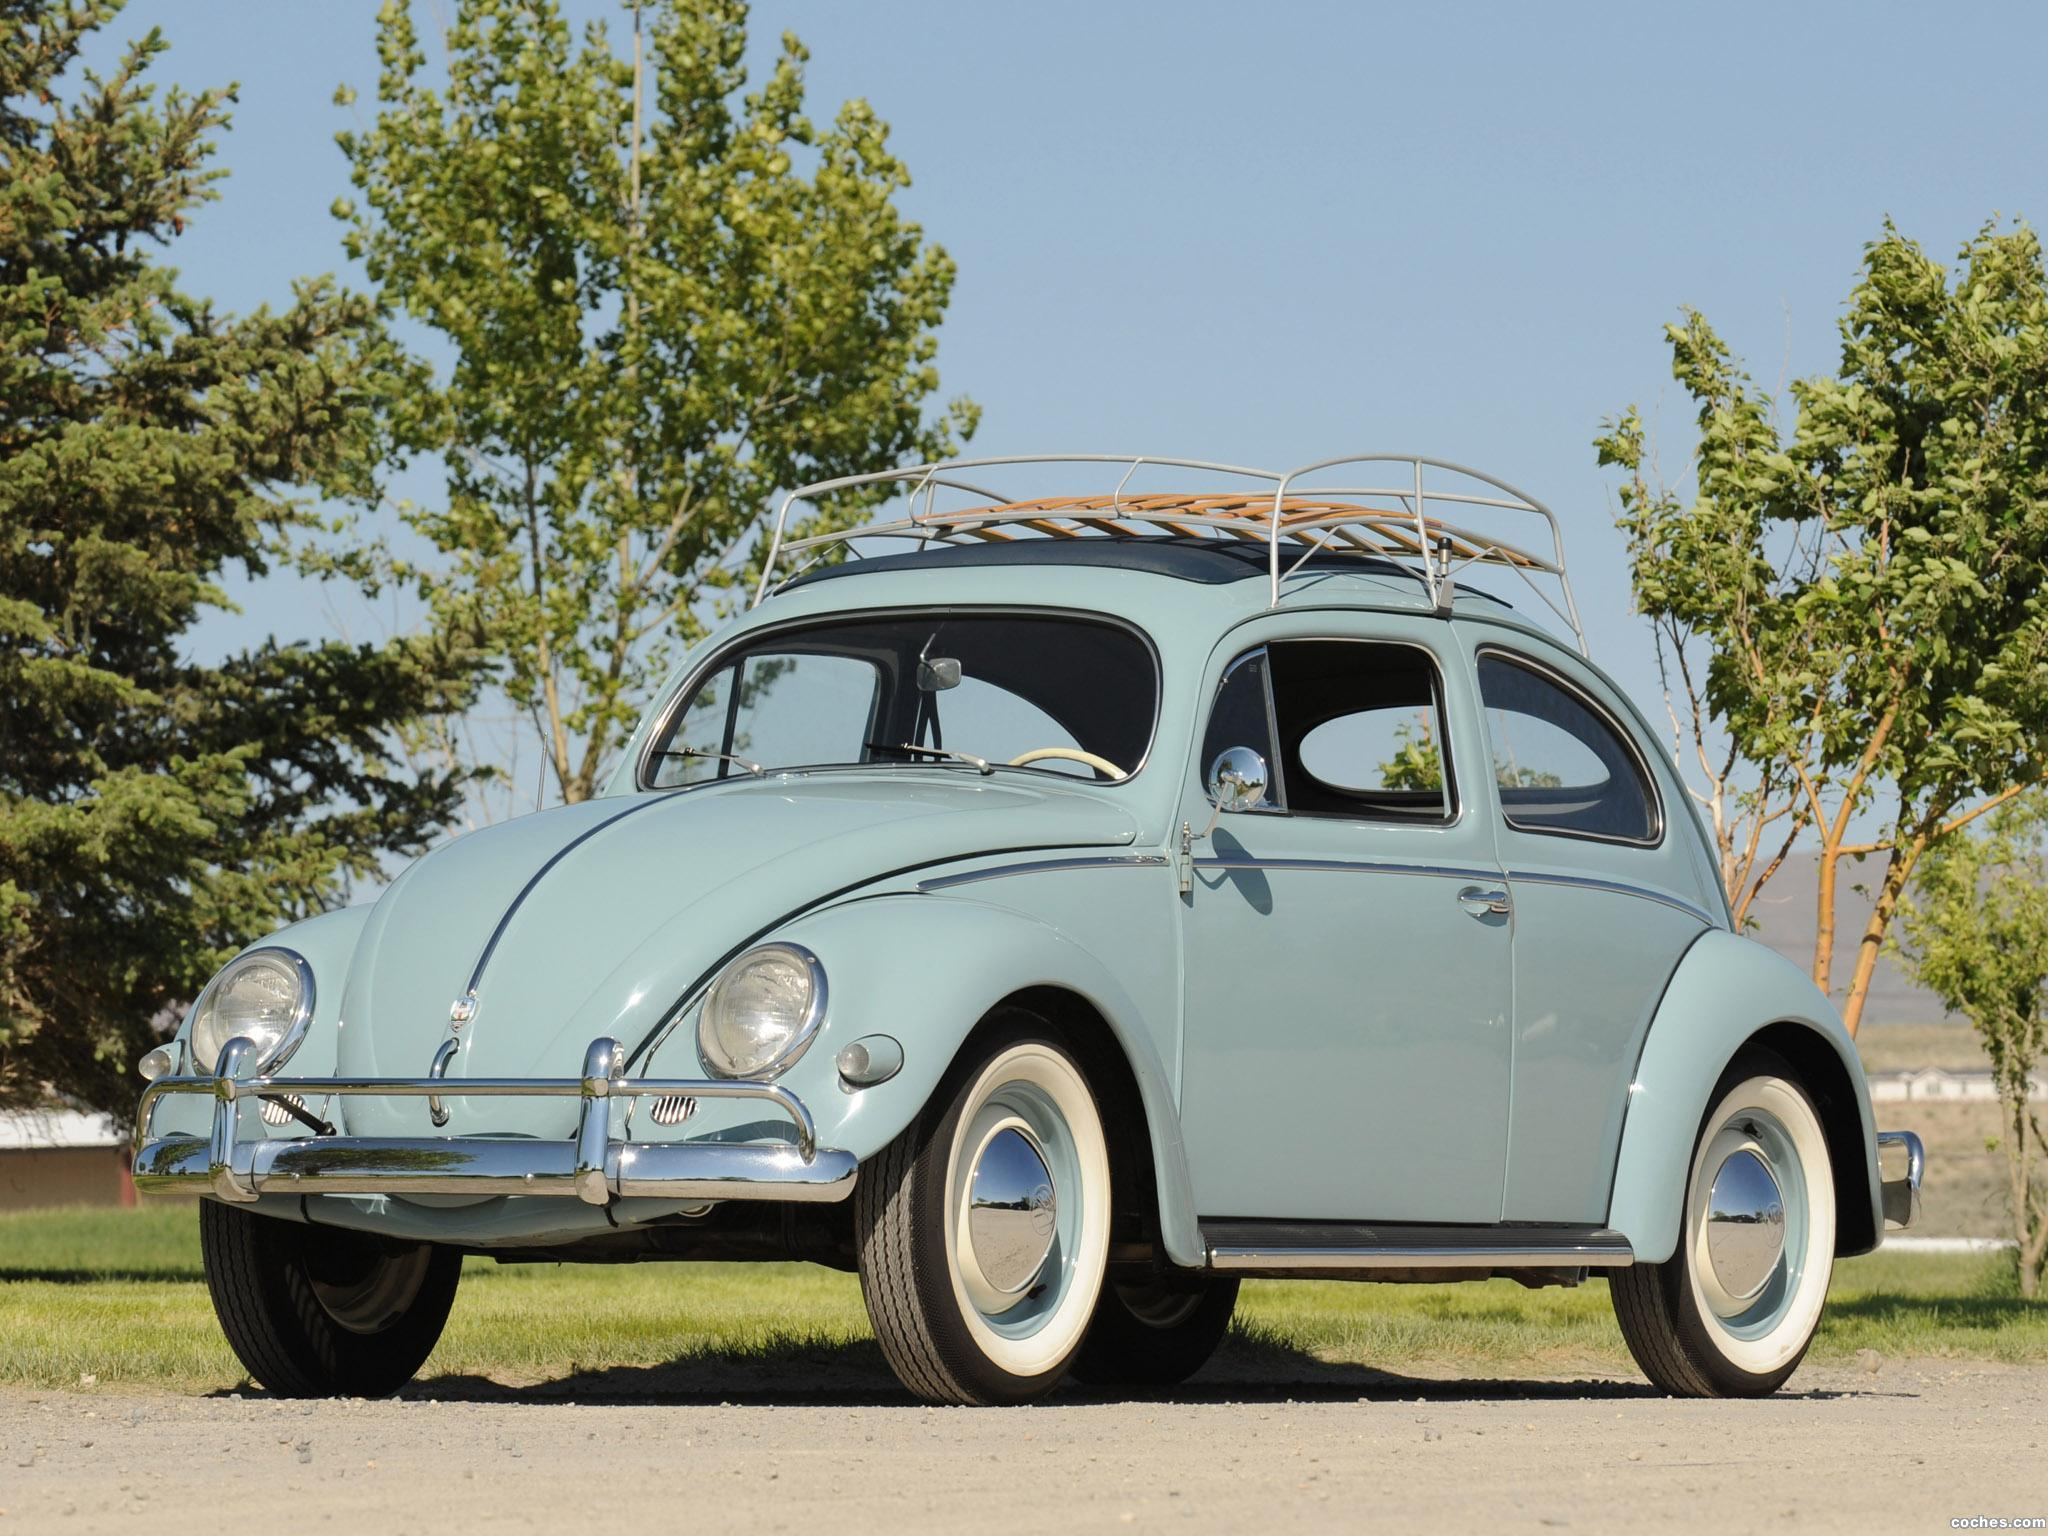 Foto gratis: Coche, Vintage, Antigua, Volkswagen -